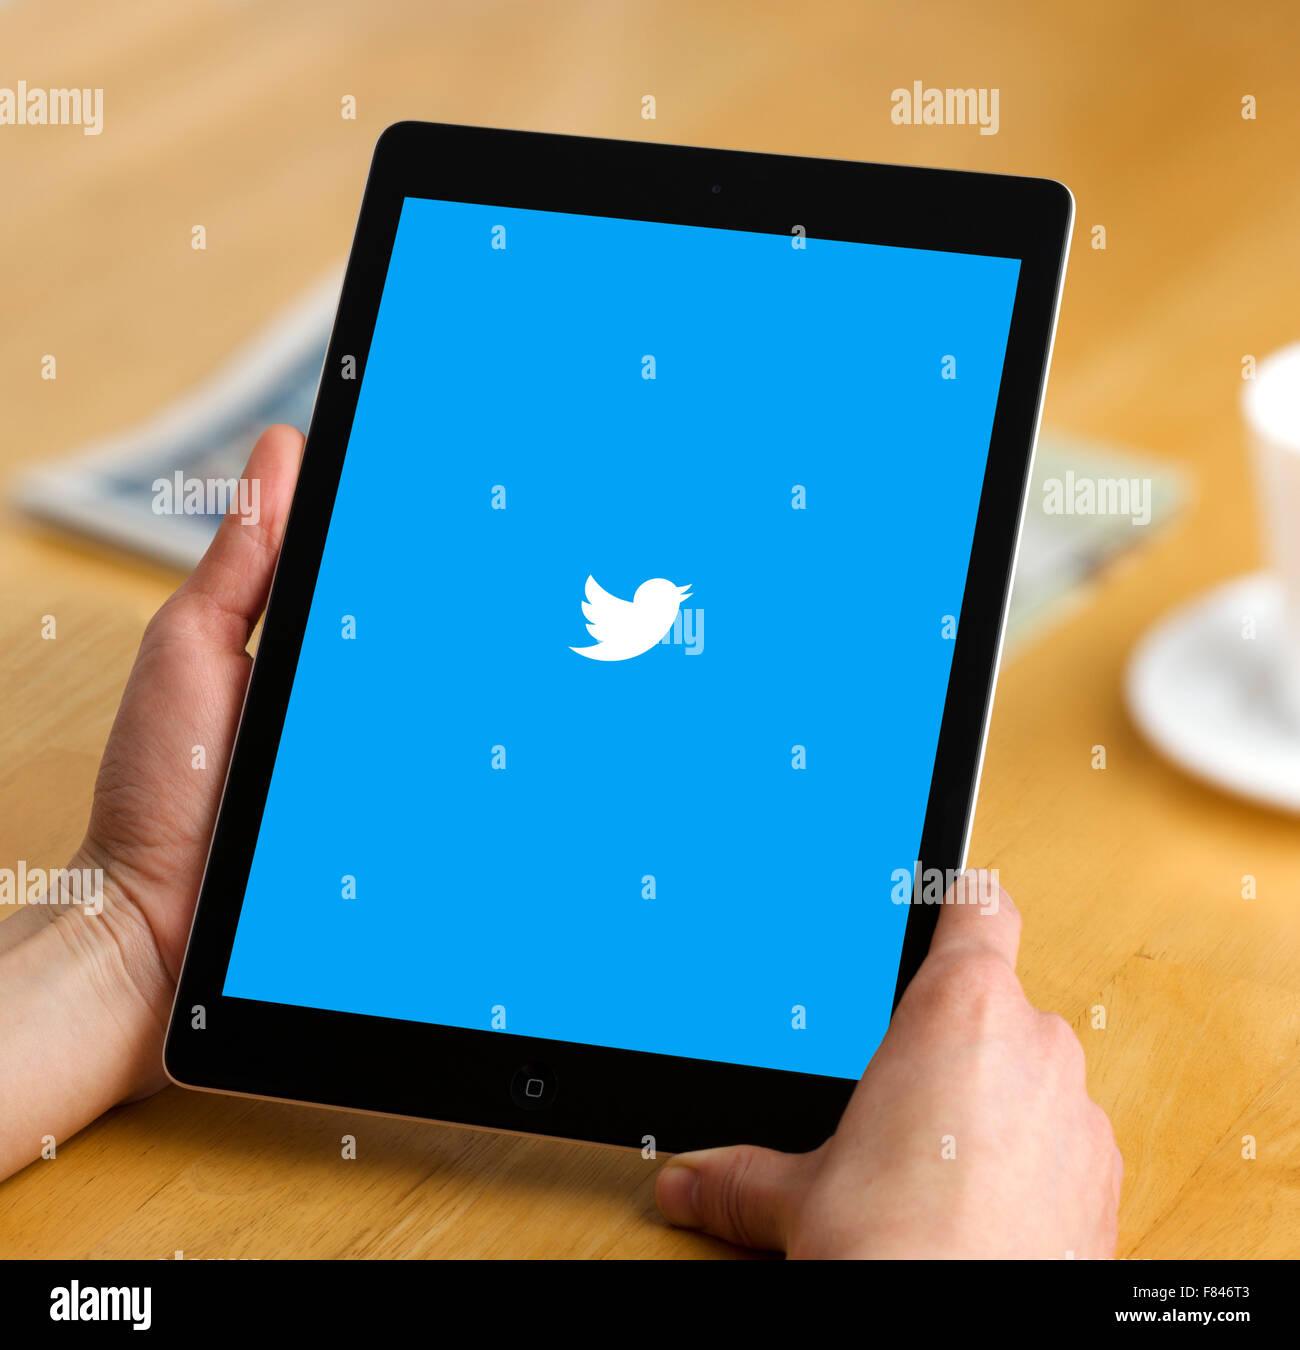 El twitter app visto en un iPad Air Imagen De Stock